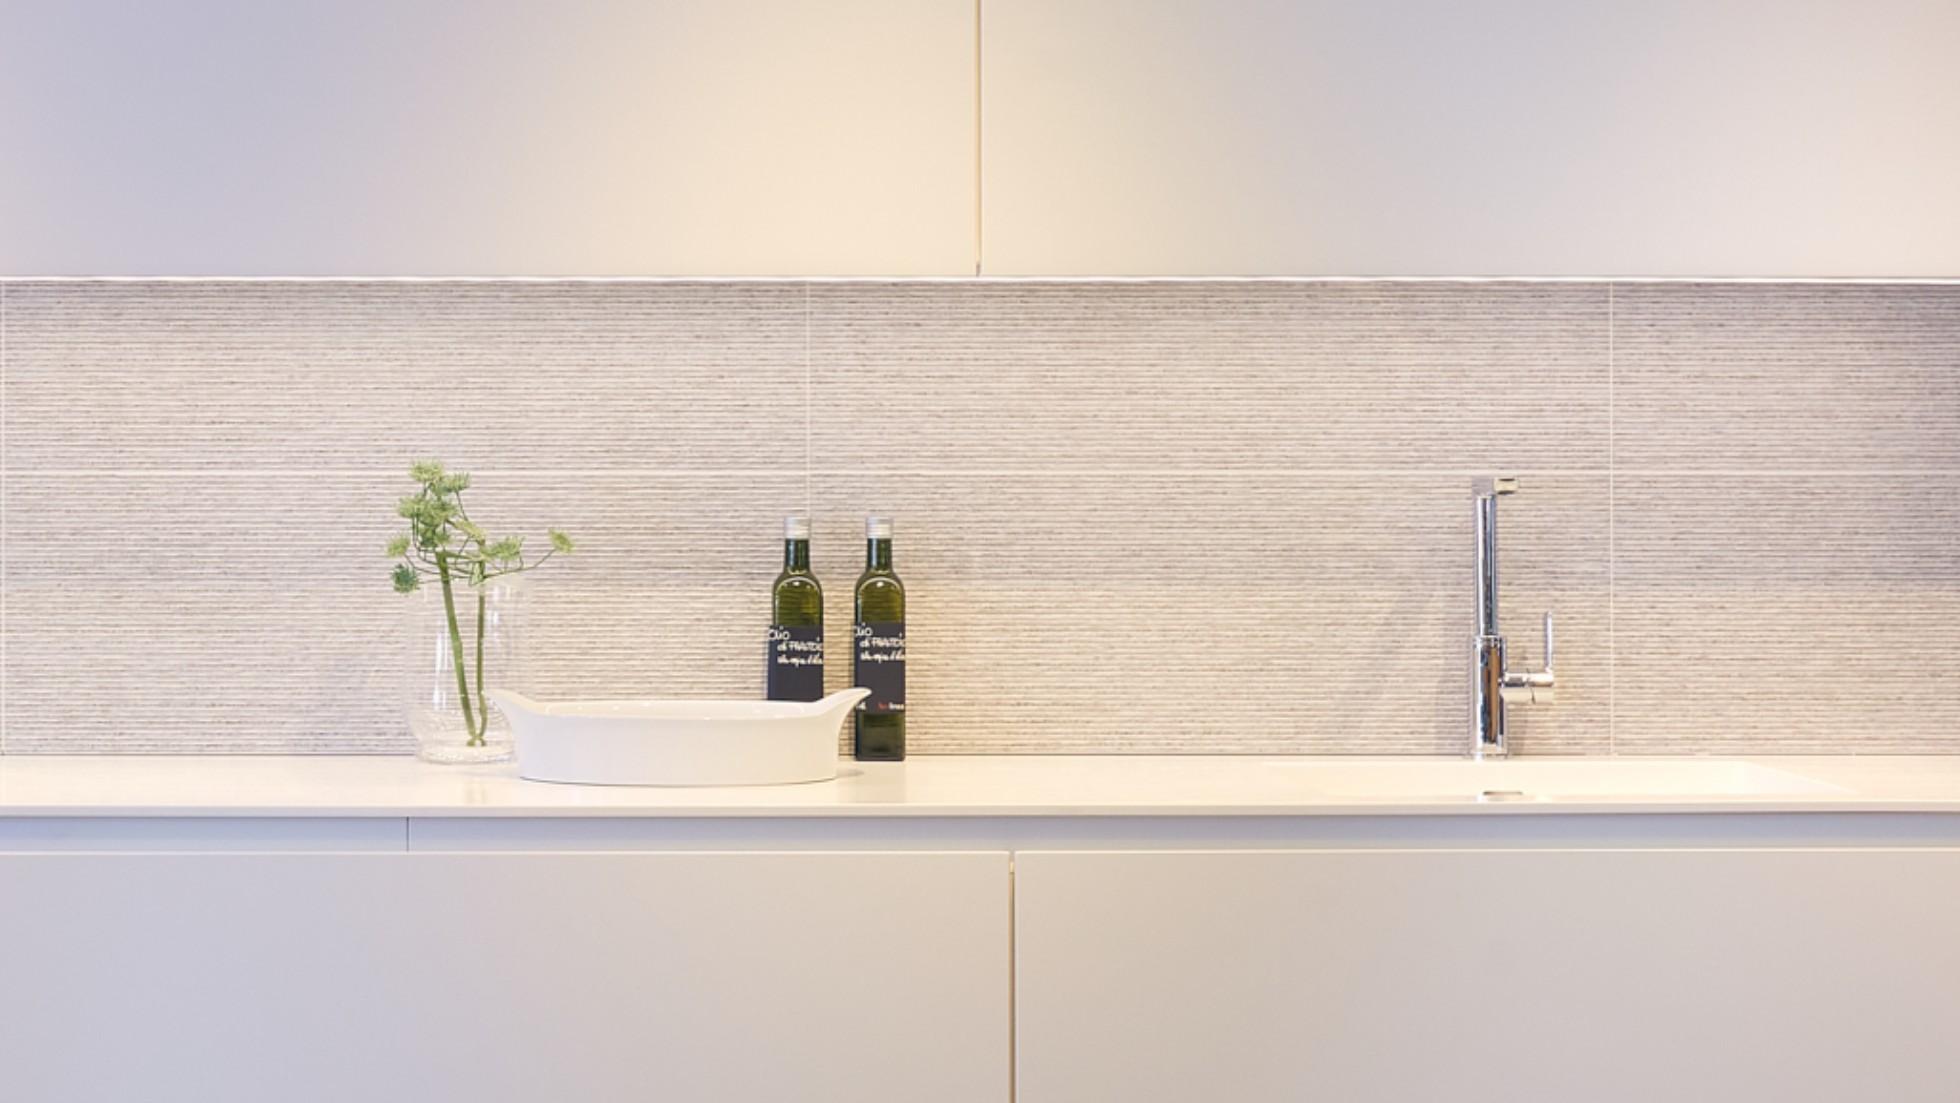 Strakke Witte Keuken : Concordia keuken & bad keukens strak witte greeploze keuken